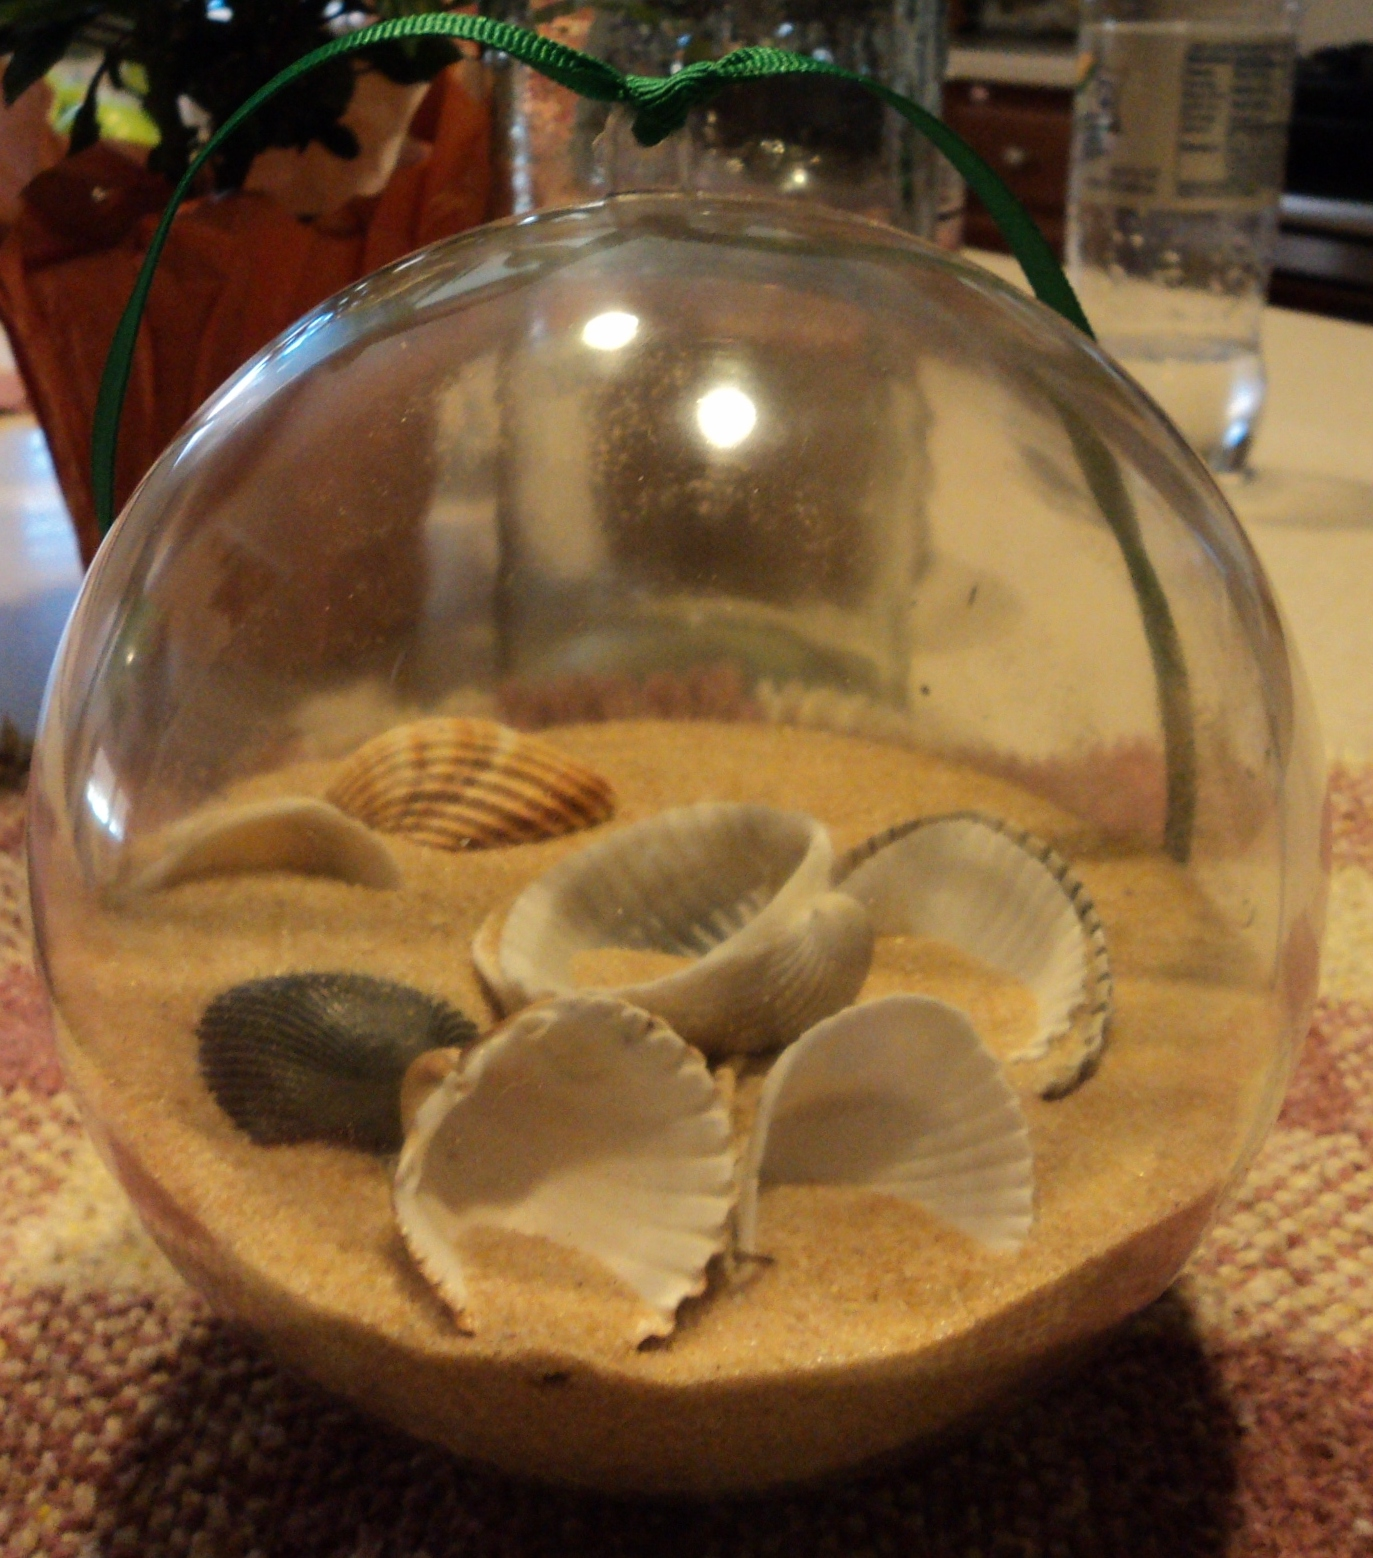 Sea shell christmas ornaments - Seashell Ornaments Craft Diy Sea Shell Garland Ornaments For The Christmas Tree Doberman S By